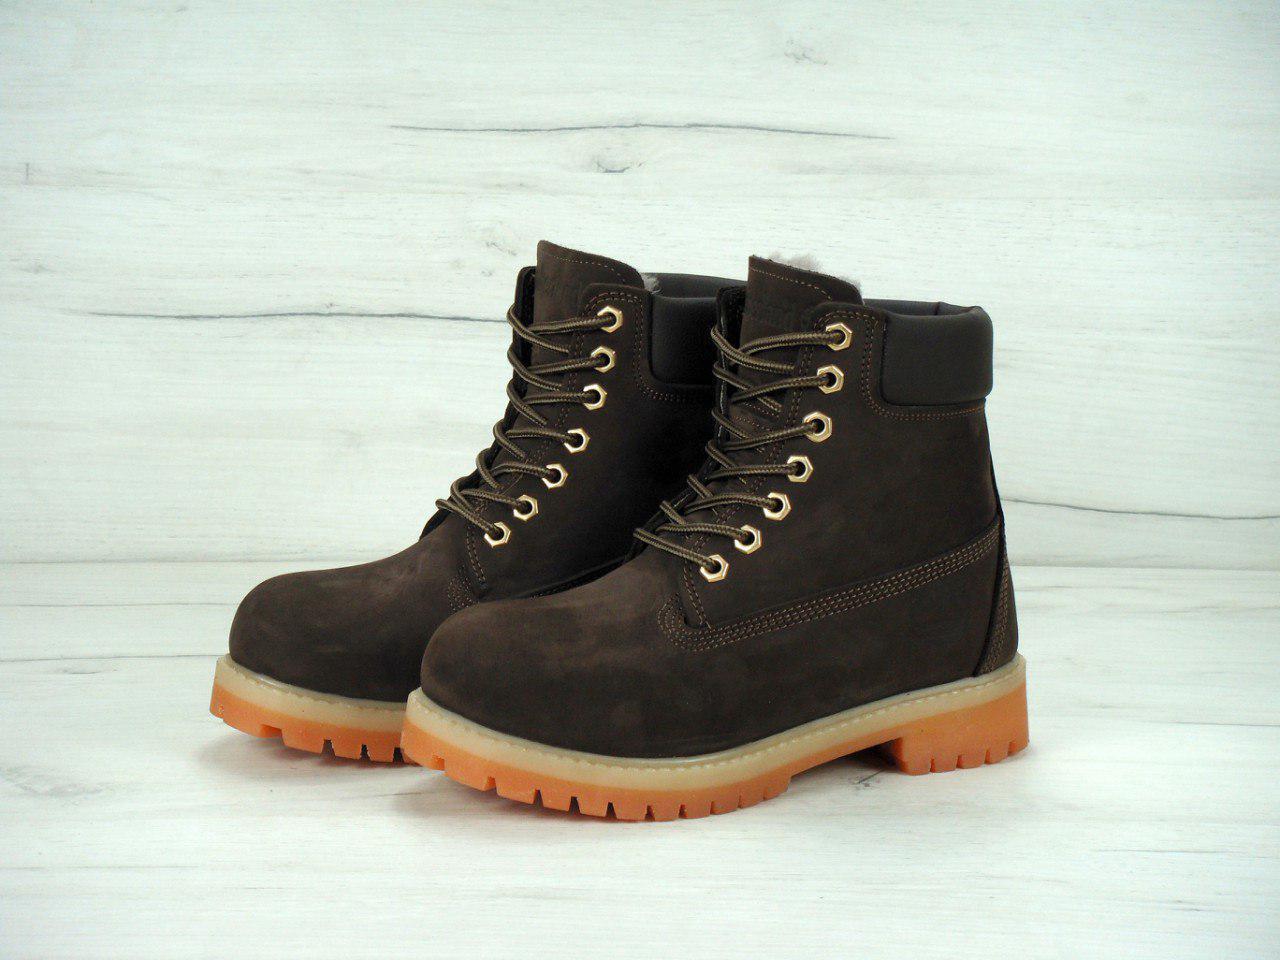 2152d862 Ботинки зимние женские в стиле Timberland код товара KD-11334. Коричневые - SNKRS  ONE